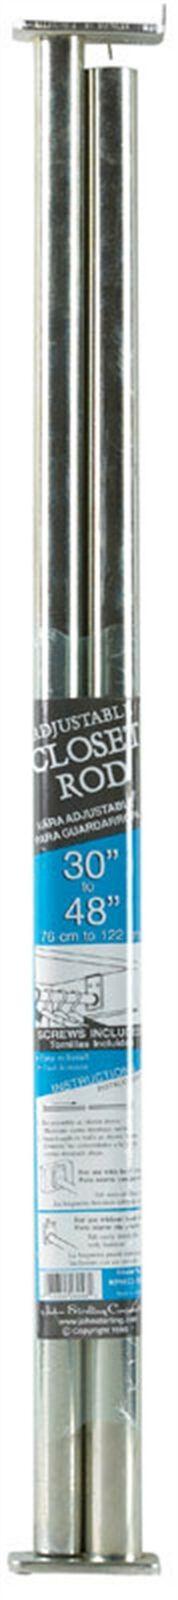 "John Sterling #RP-0022-30//48 30-48/"" ADJ Closet Rod,No RP-0022-30//48"